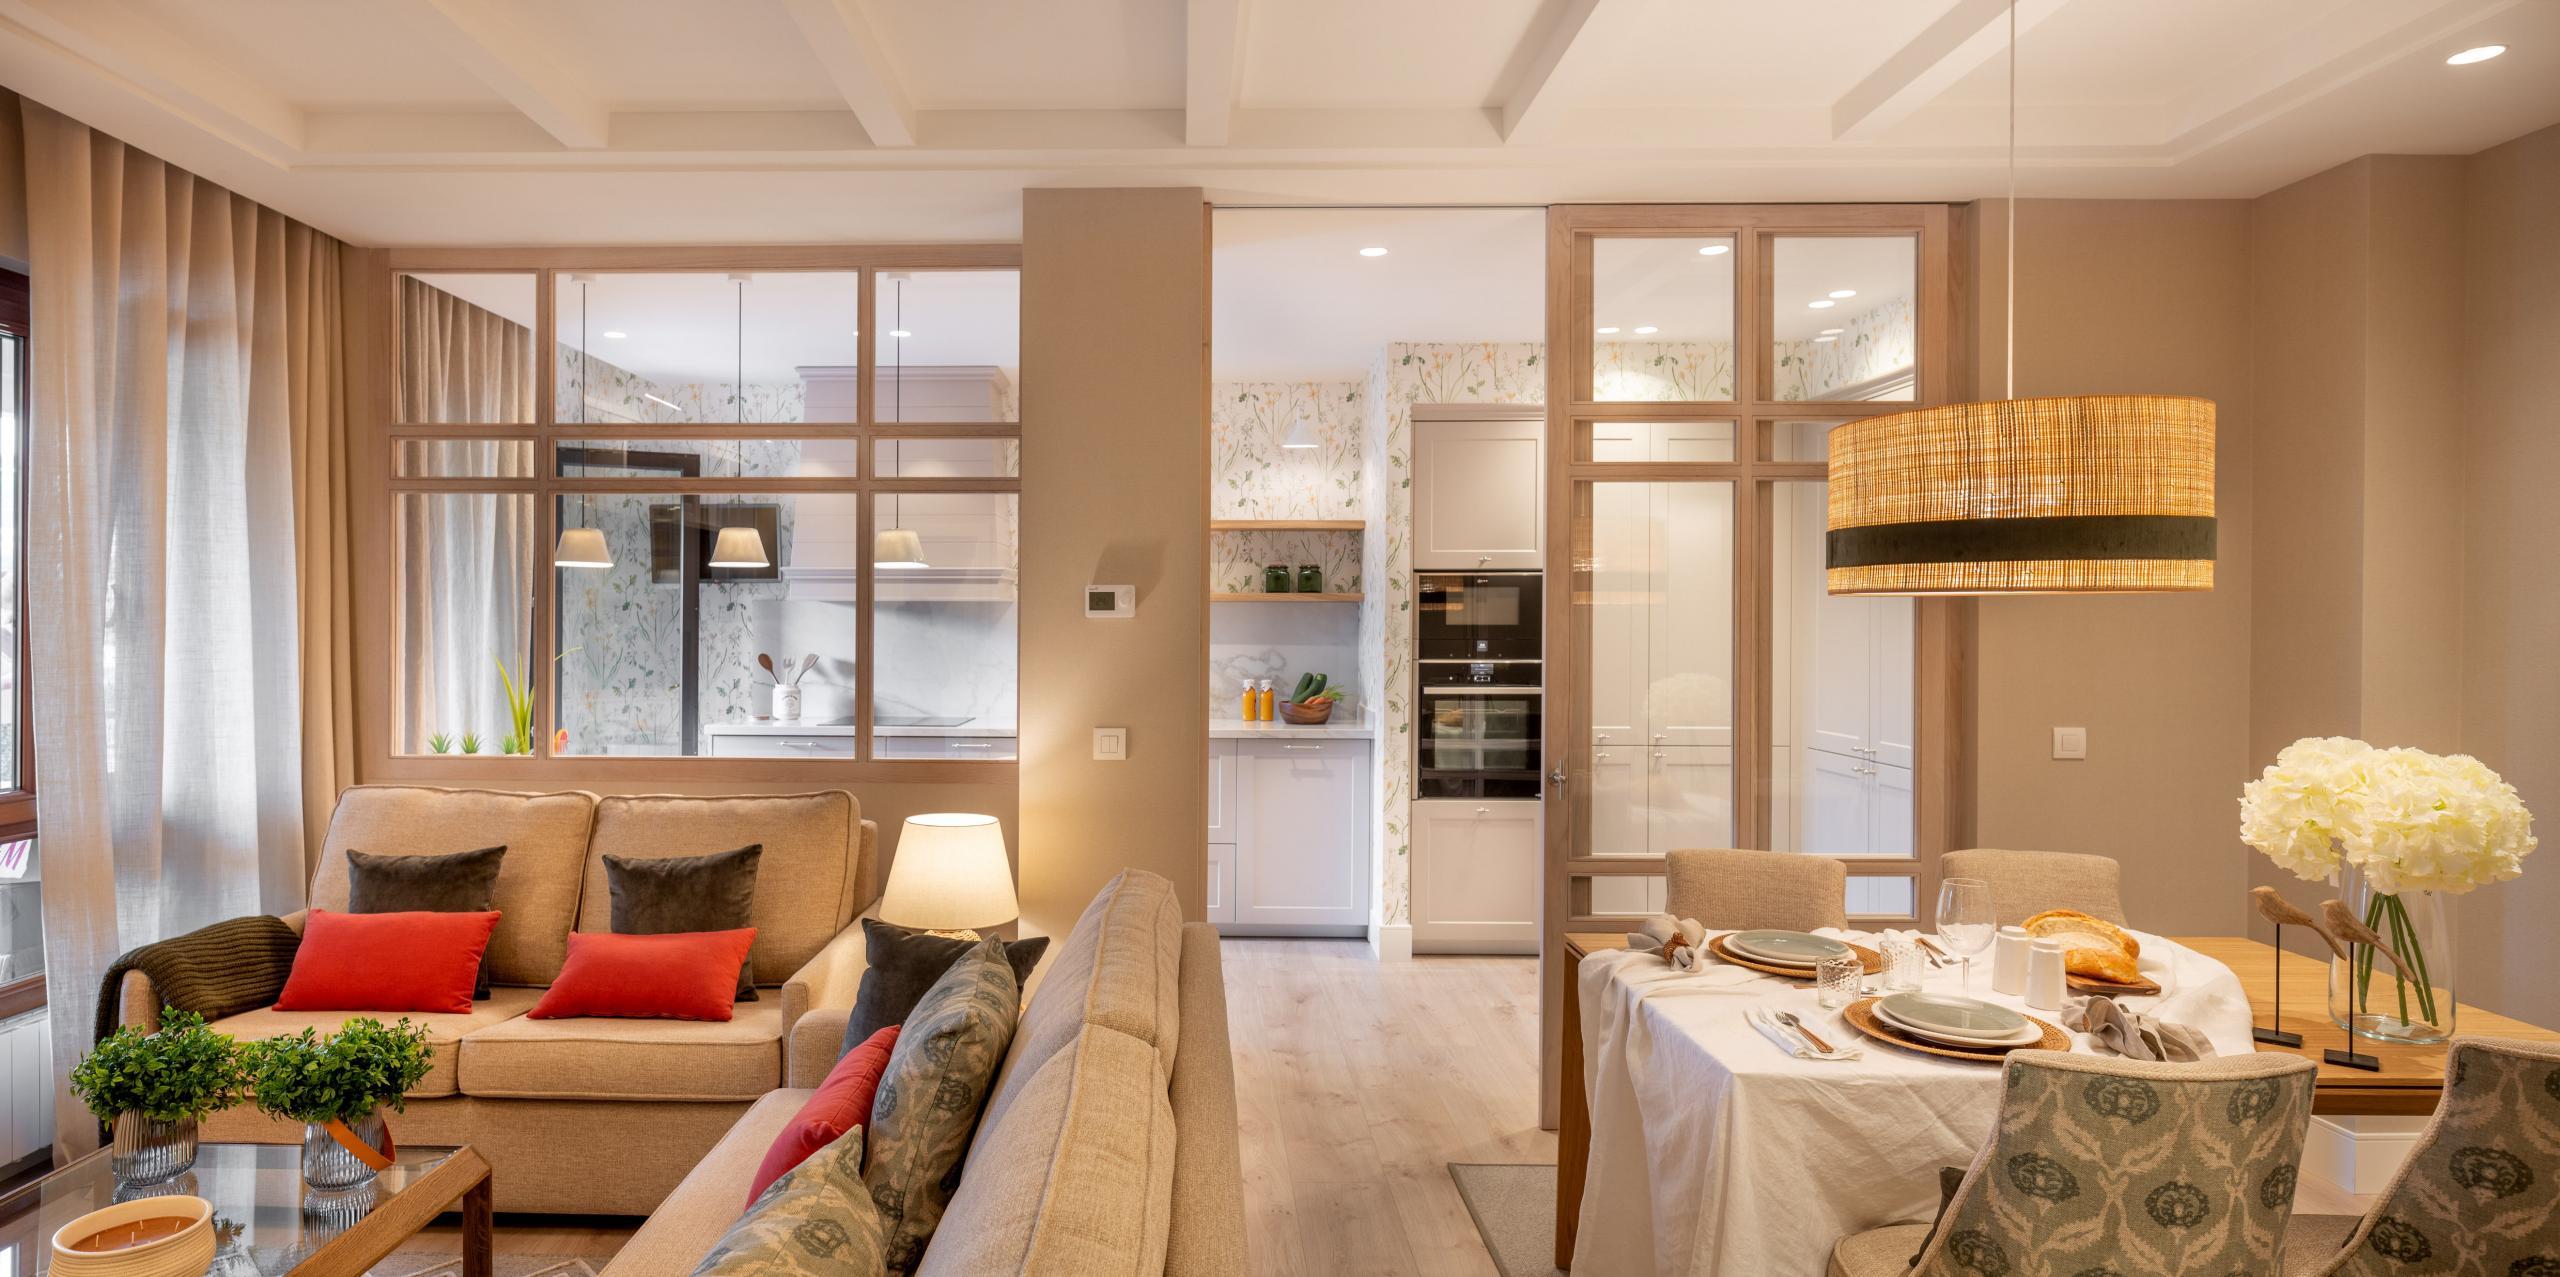 Decoración de salón comedor abierto a cocina